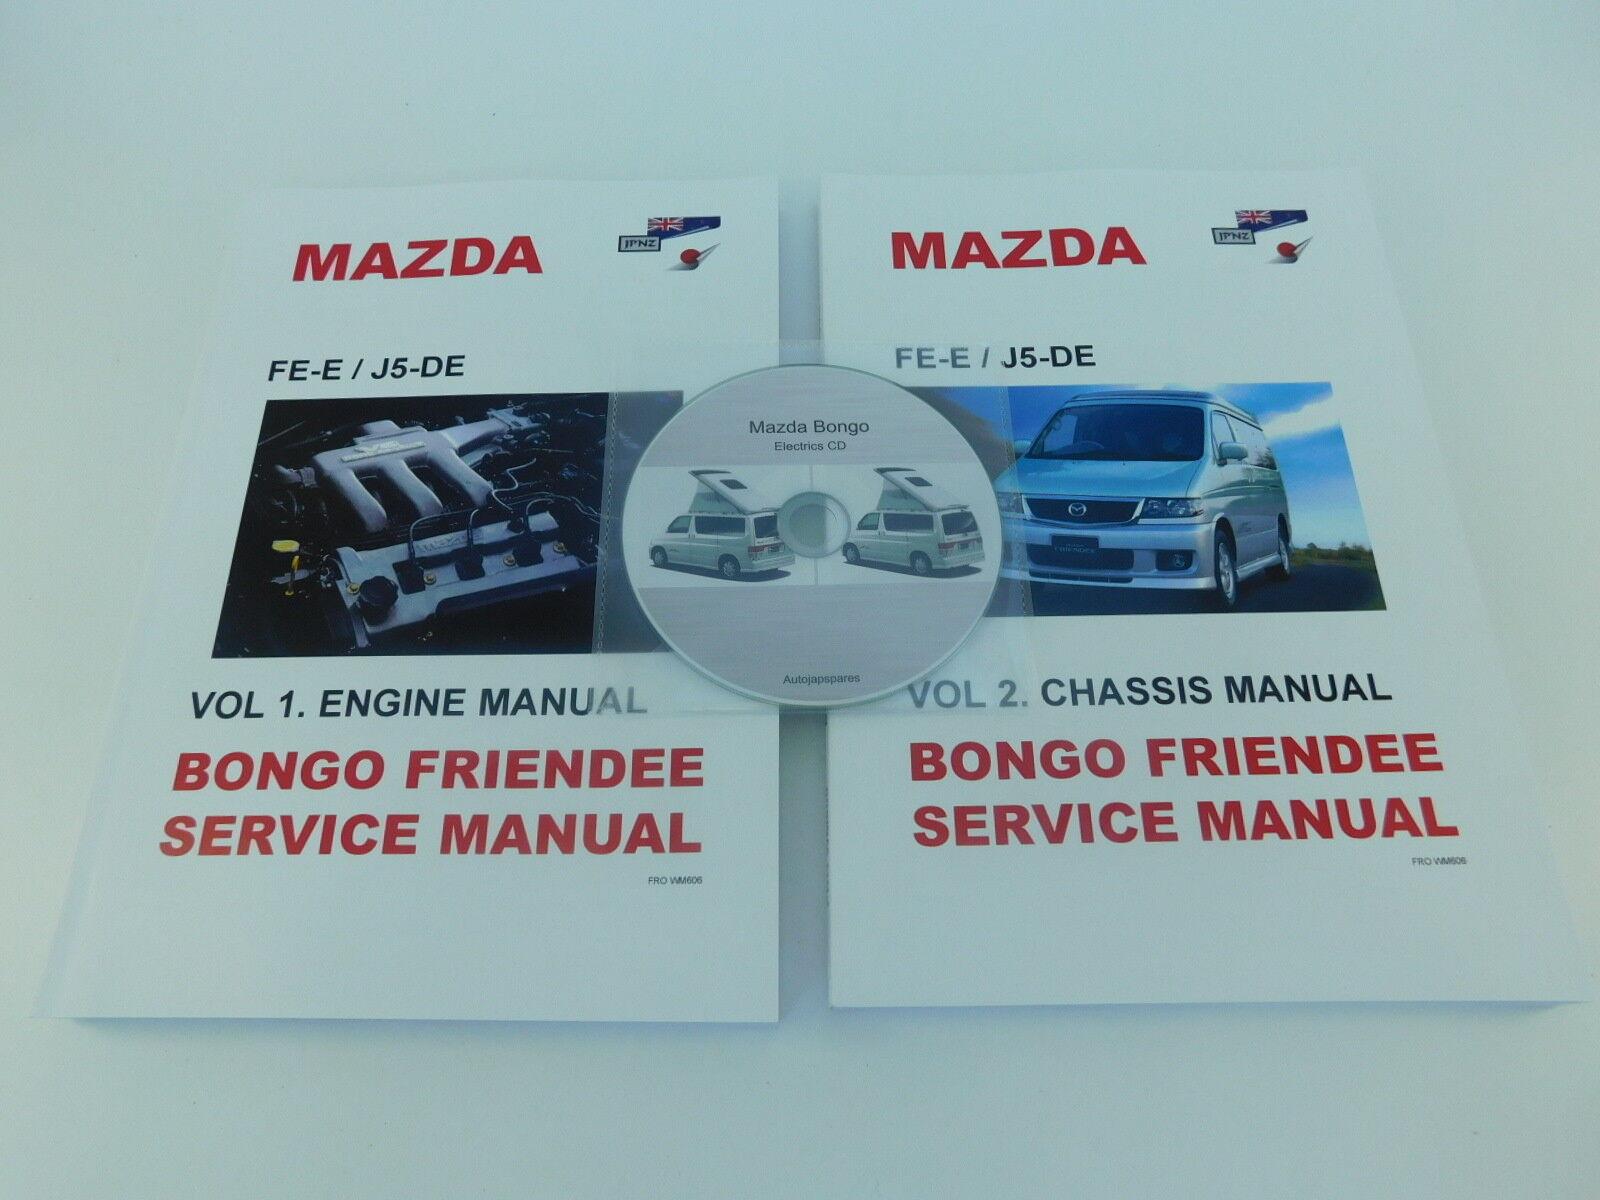 Mazda Friendee Manual Verisa Fuse Box Bongo 273 Offside Array Fro606cd Ebay Rh